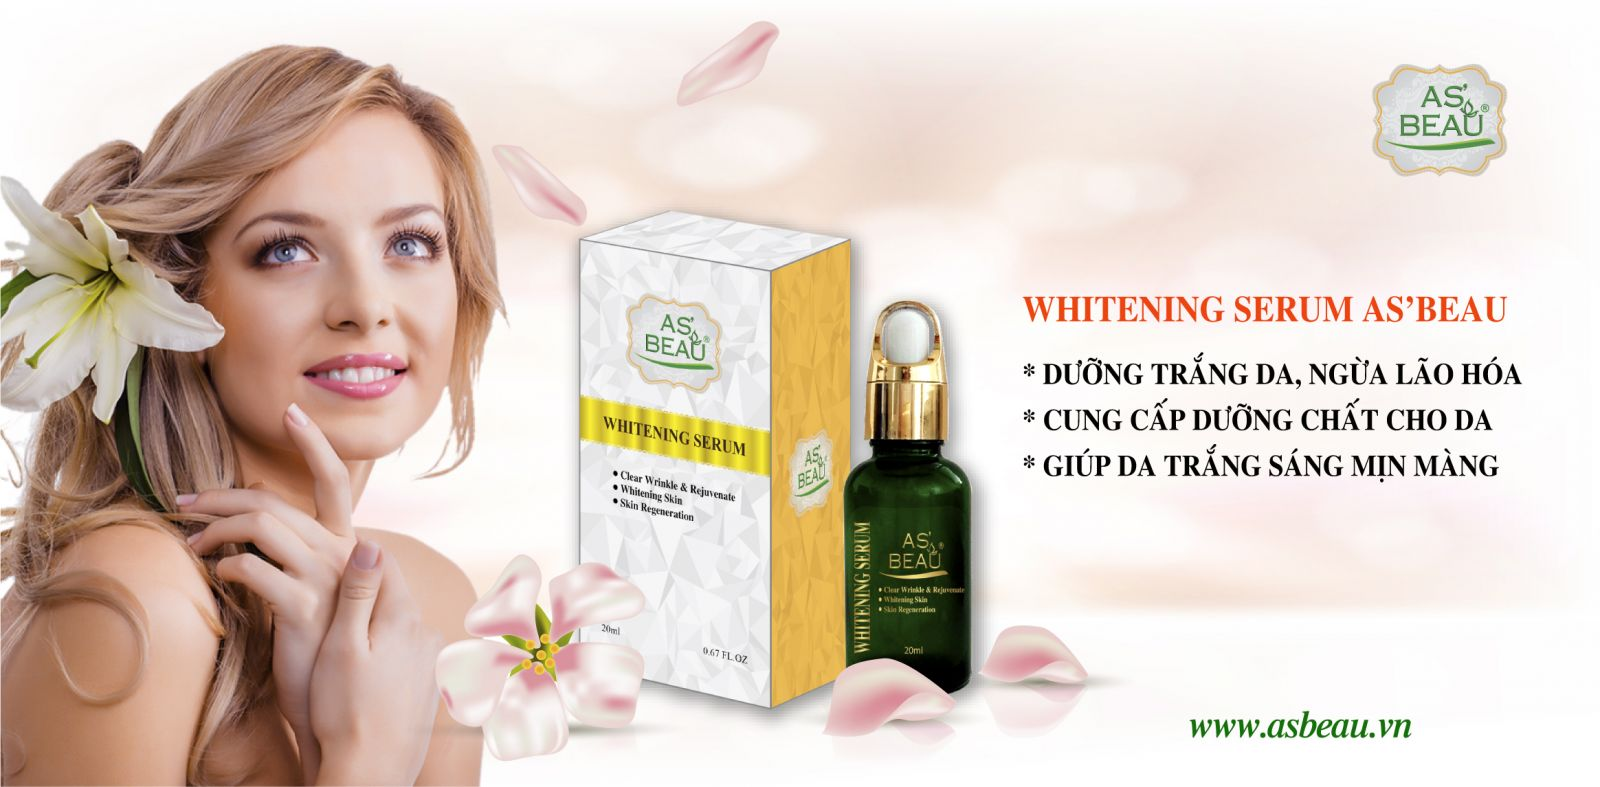 serum dưỡng trắng da, asbeau, whitening serum